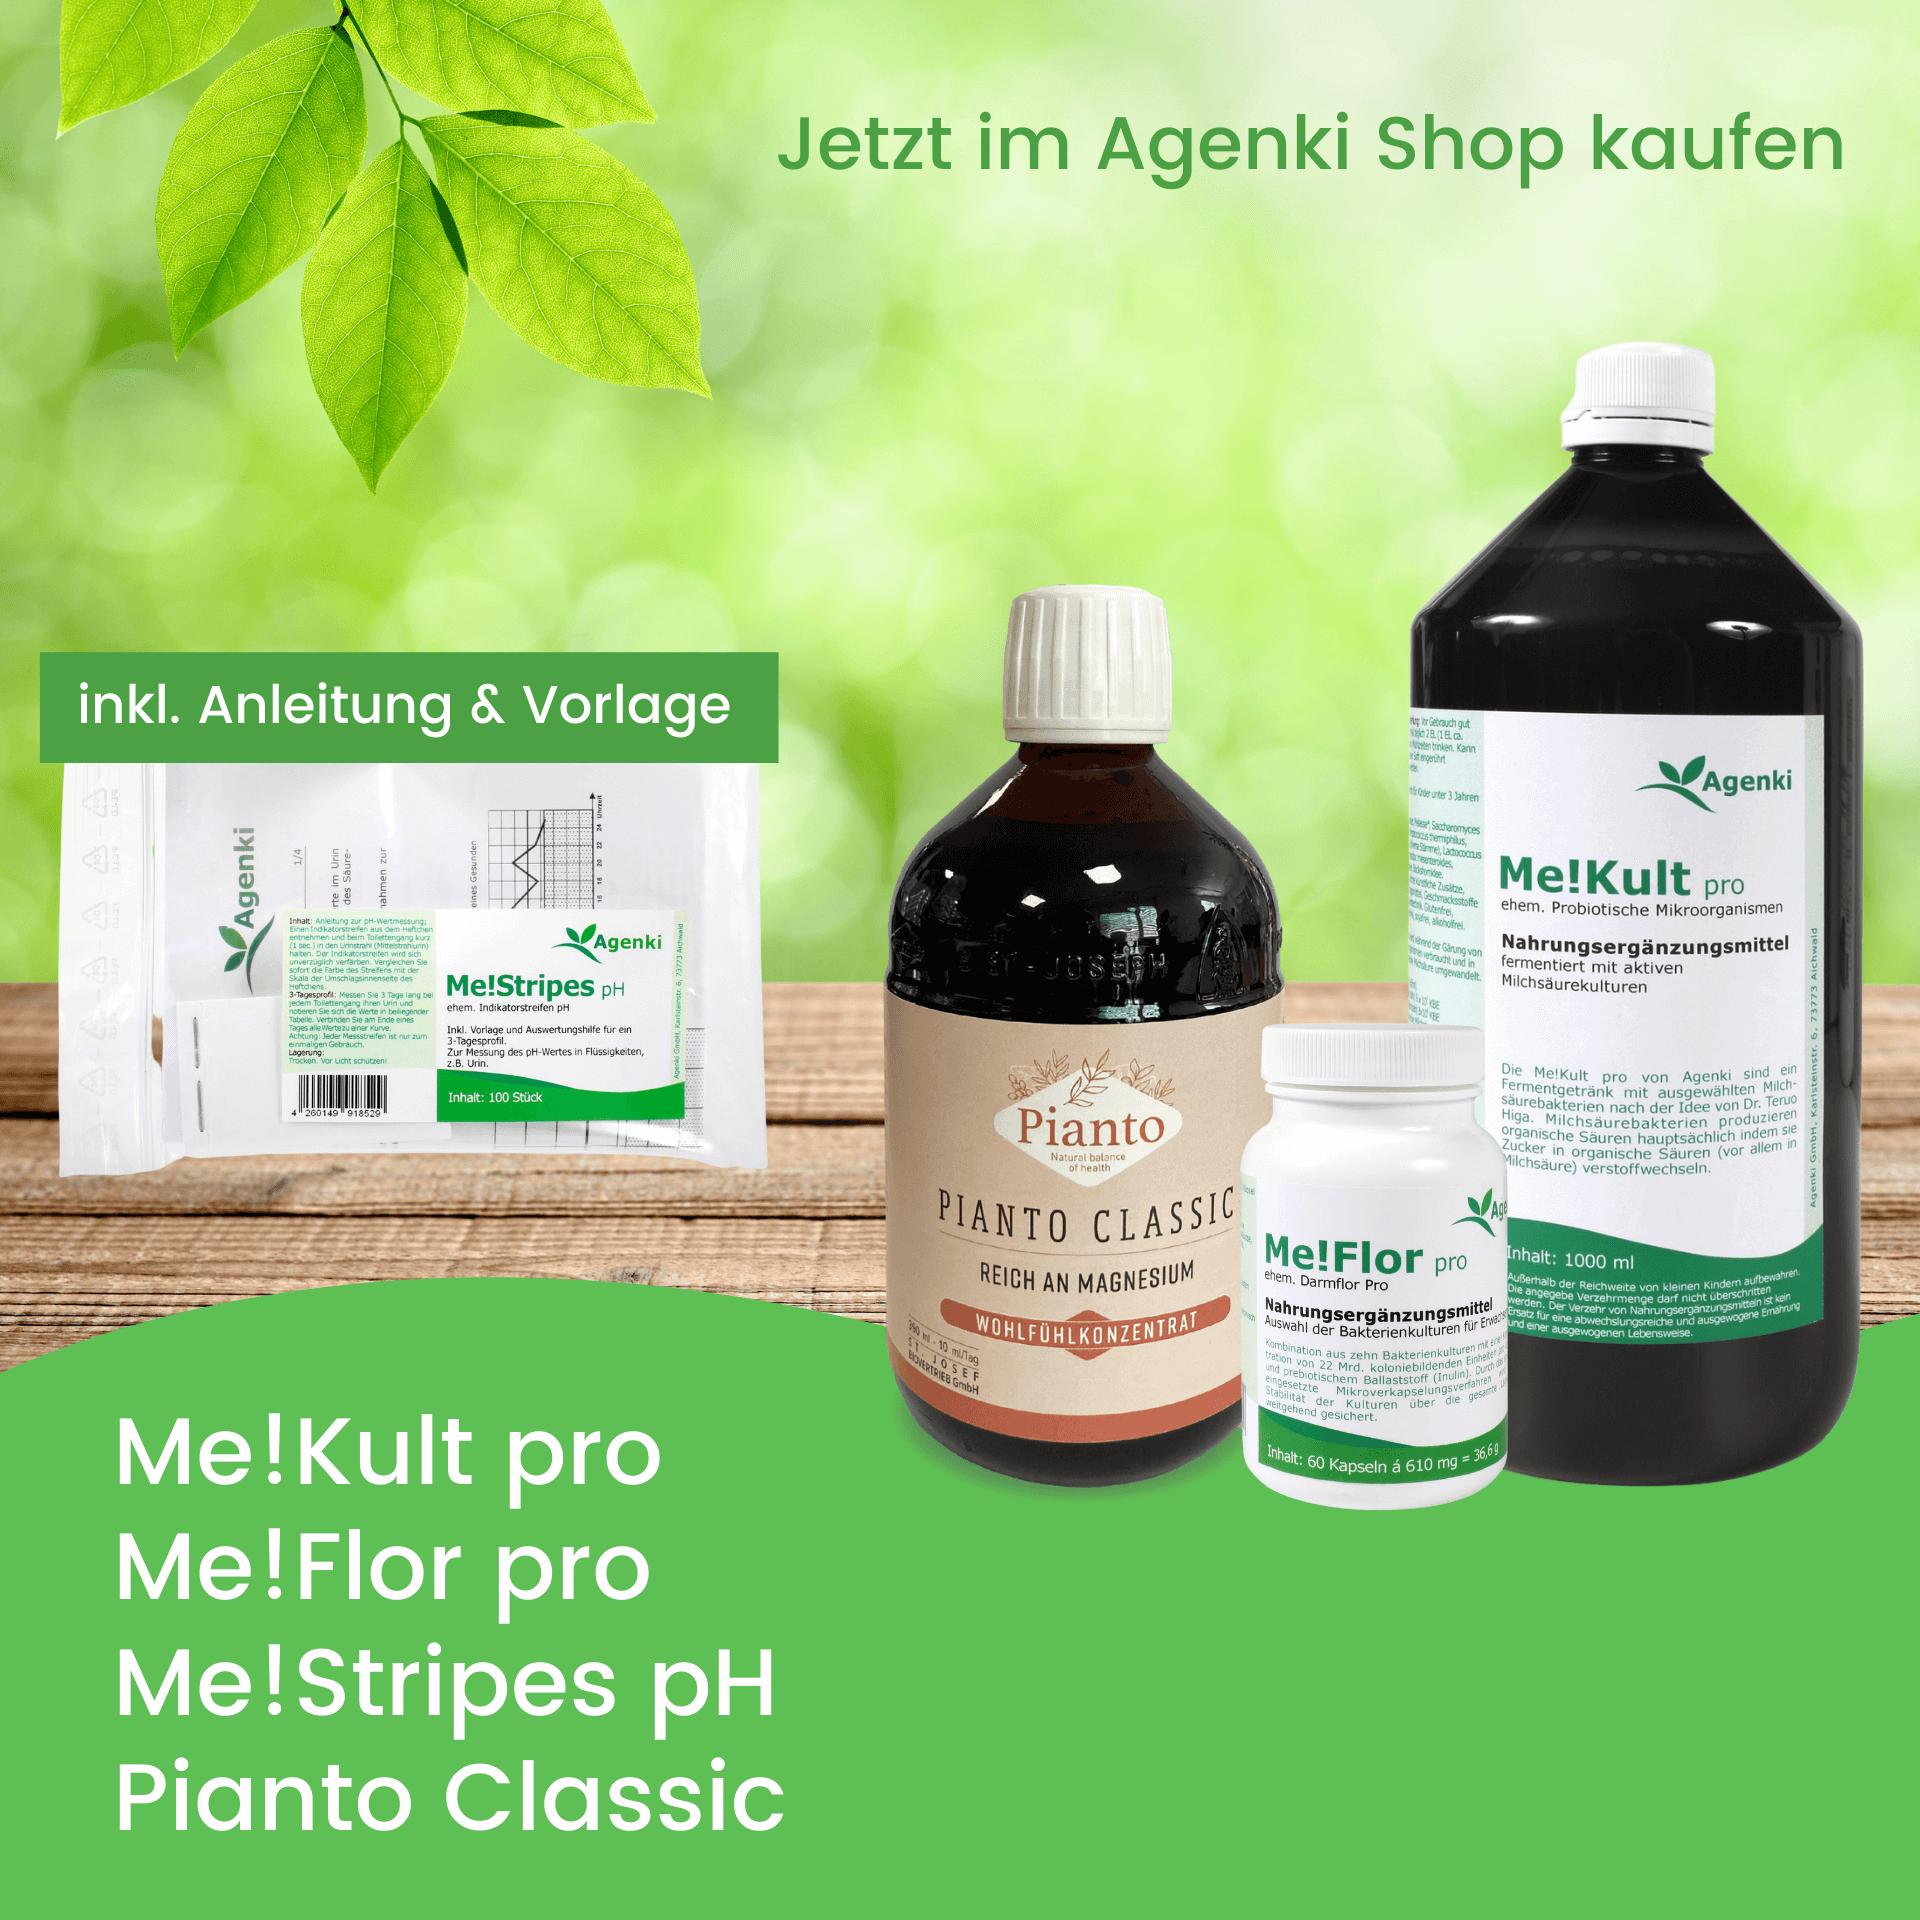 Me!Kult pro - Mikroorganismen, Me!Flor pro - Darmbakterien, Me!Stripes pH - pH Wert Urin Teststreifen und Pianto Classic - Agenki